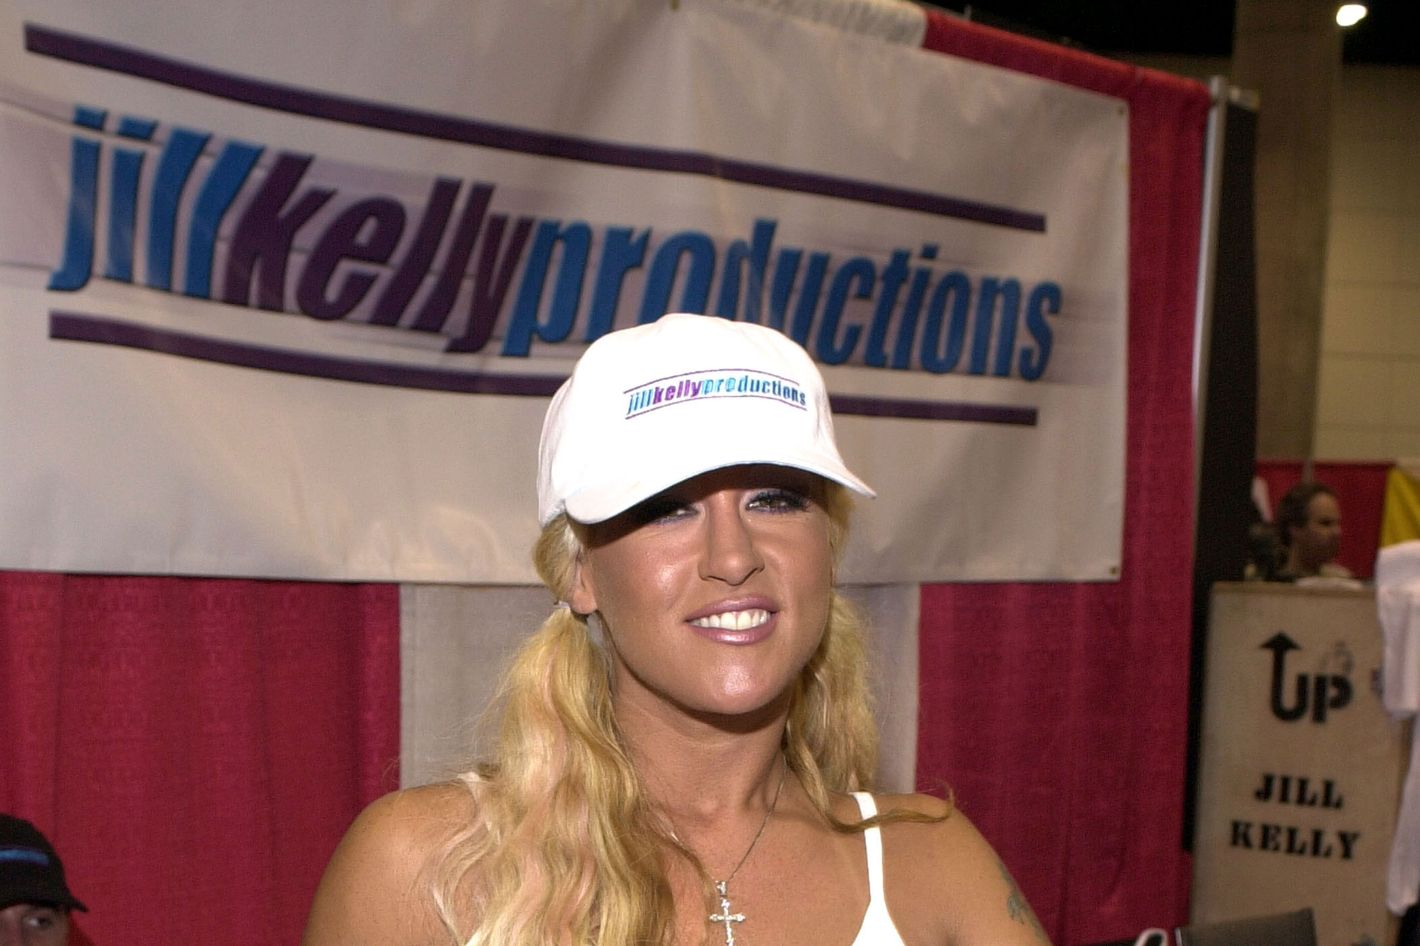 Jill Kelly Pornstar Biography Gamelink-pic392